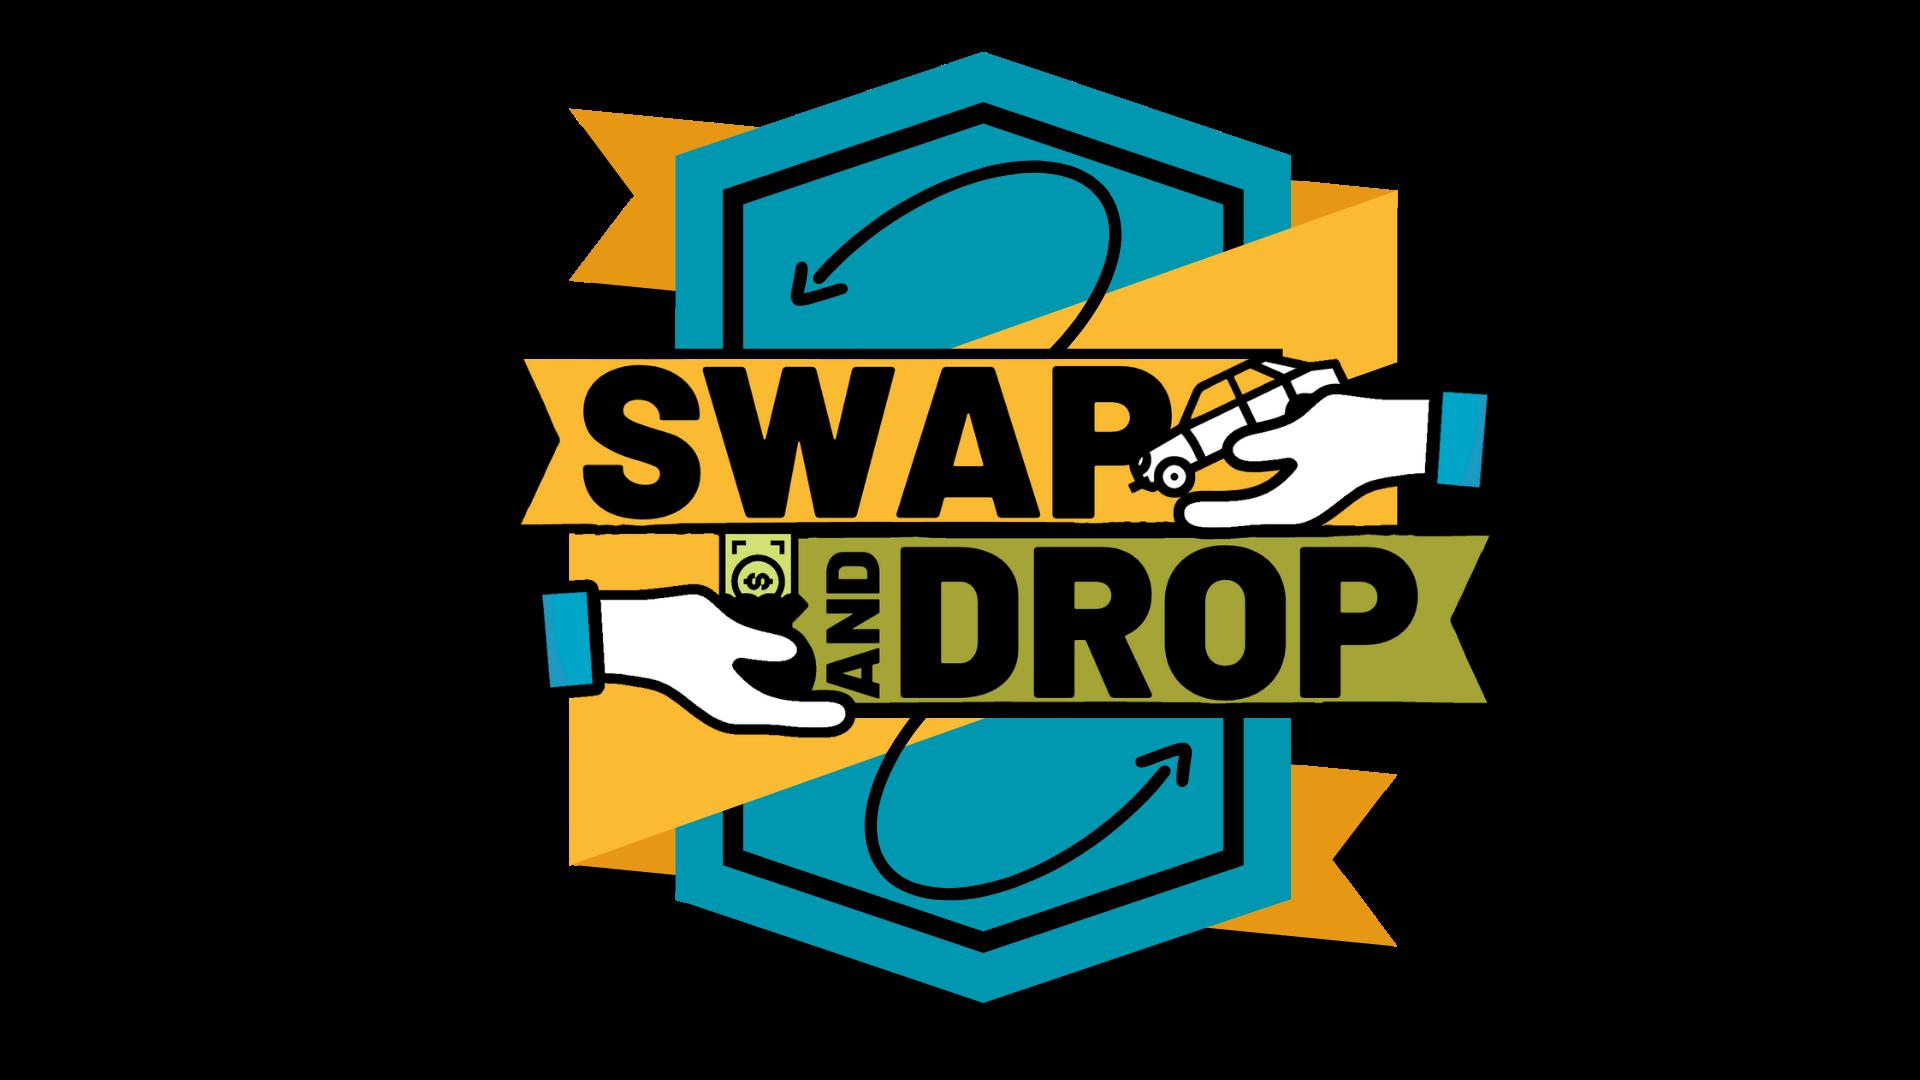 Swap & Drop Crest Logo 2020